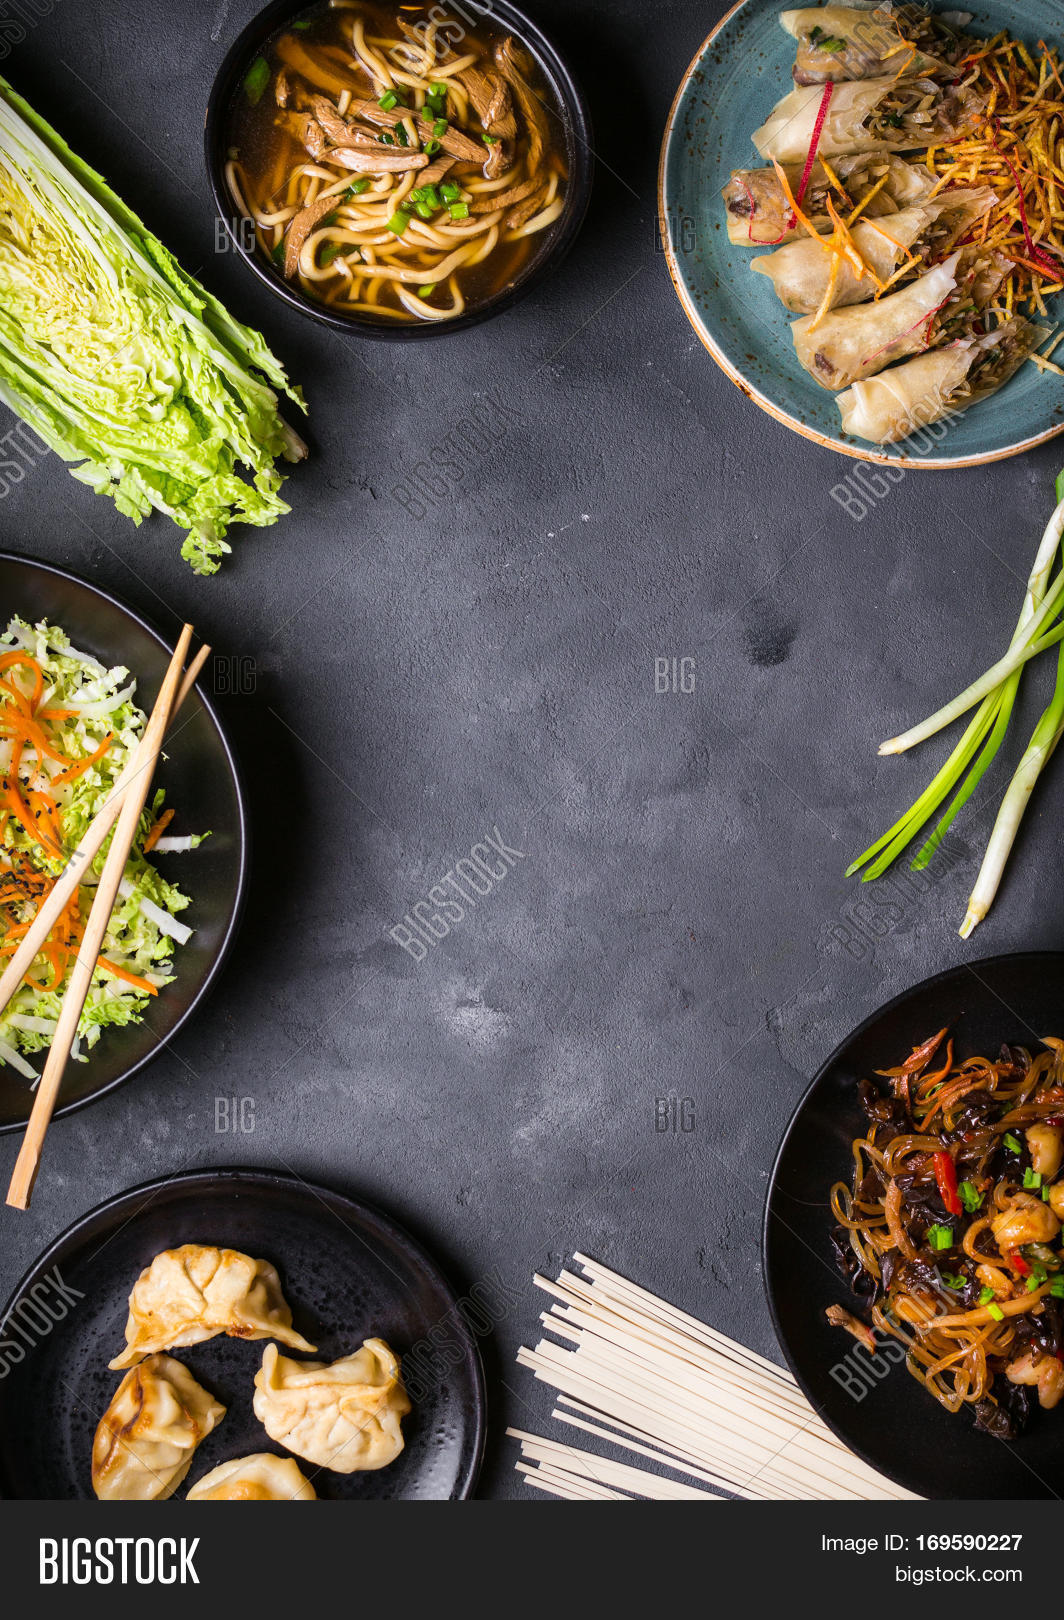 Chinese Food Image Photo Free Trial Bigstock